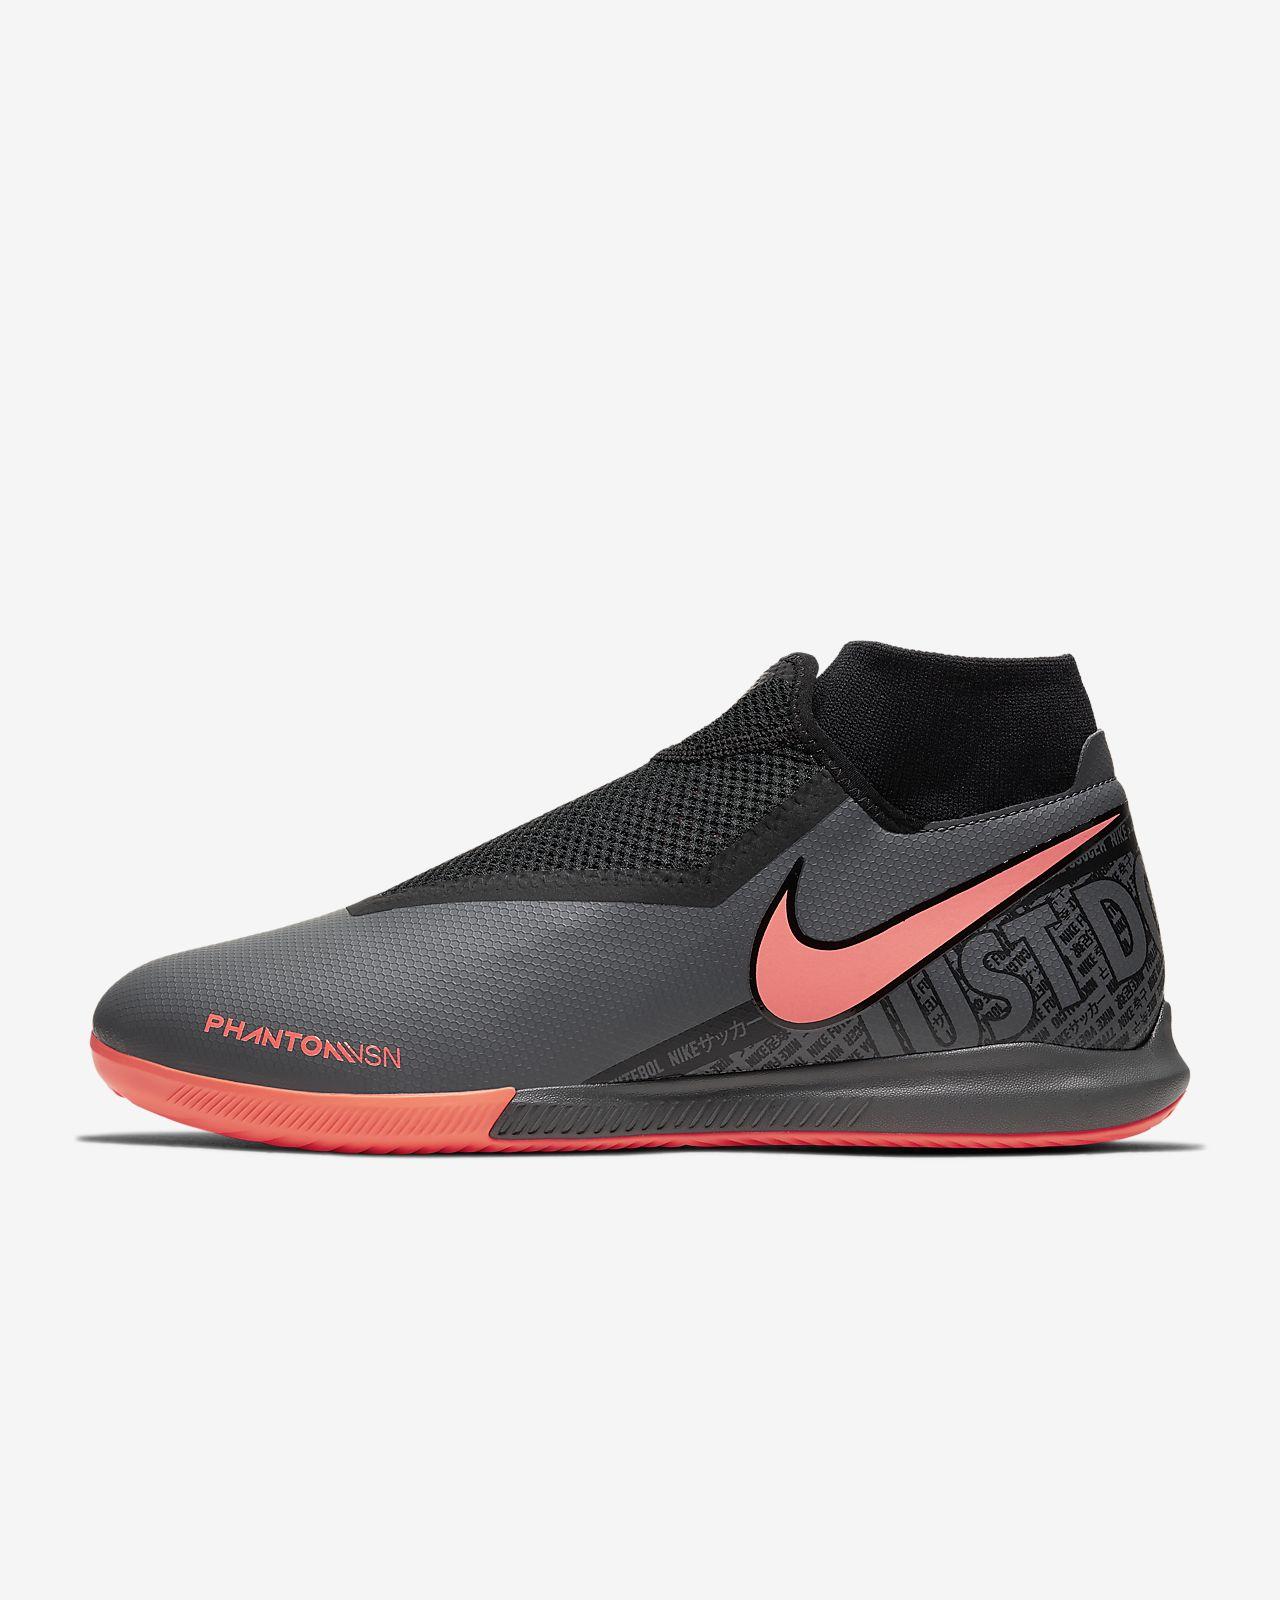 Nike Phantom Vision Academy Dynamic Fit IC Indoor/Court Football